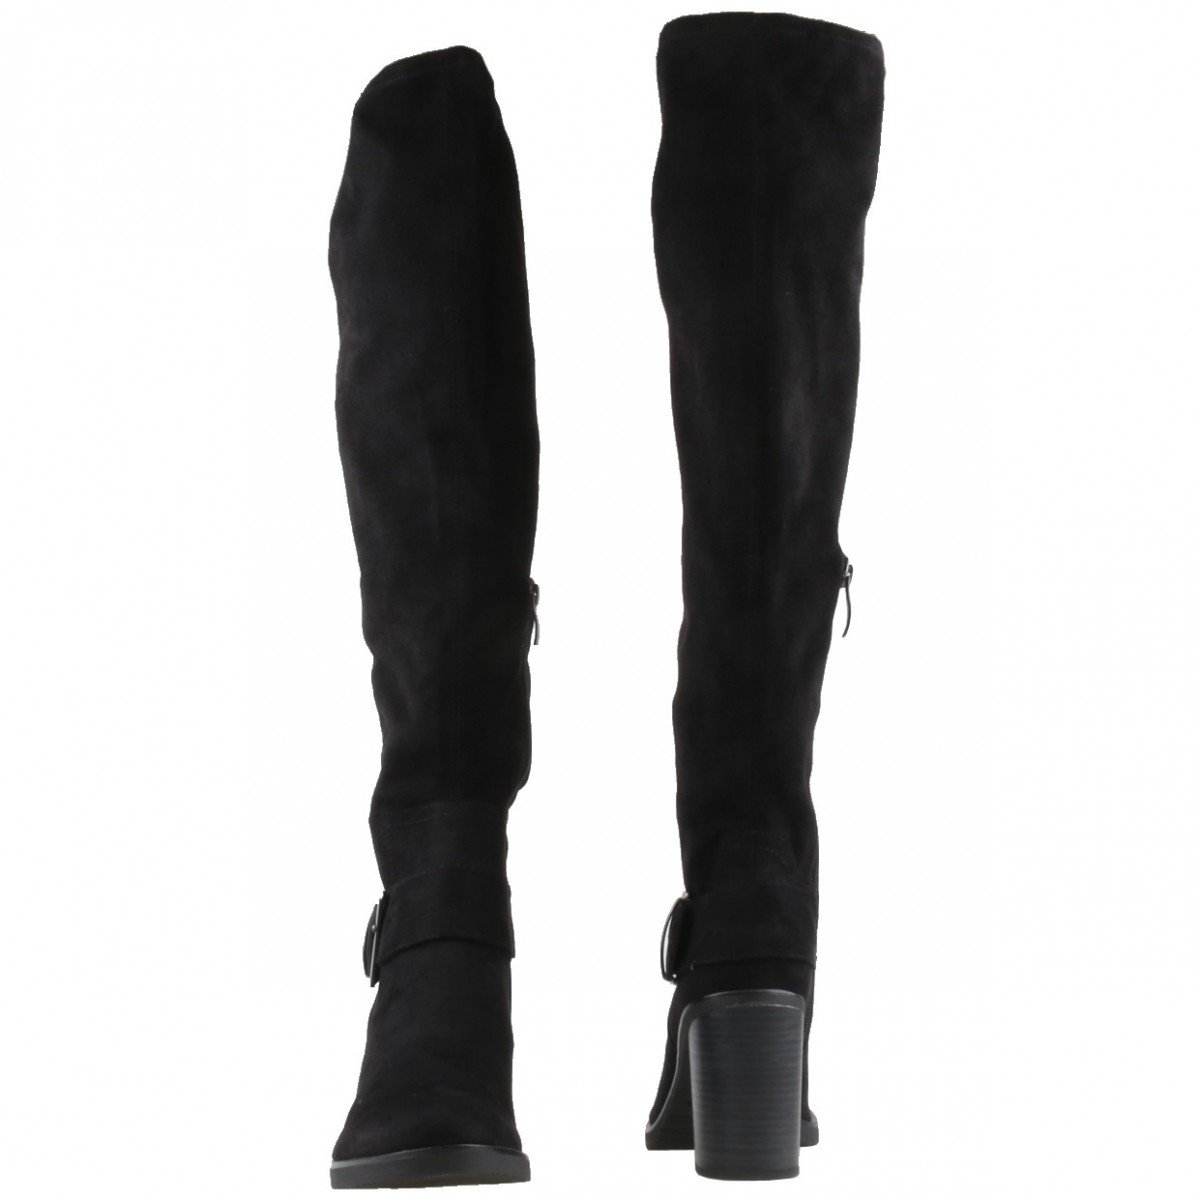 Tamaris 001) Damen Overknee Stiefel Schwarz Schwarz (schwarz 001) Tamaris c05a9a